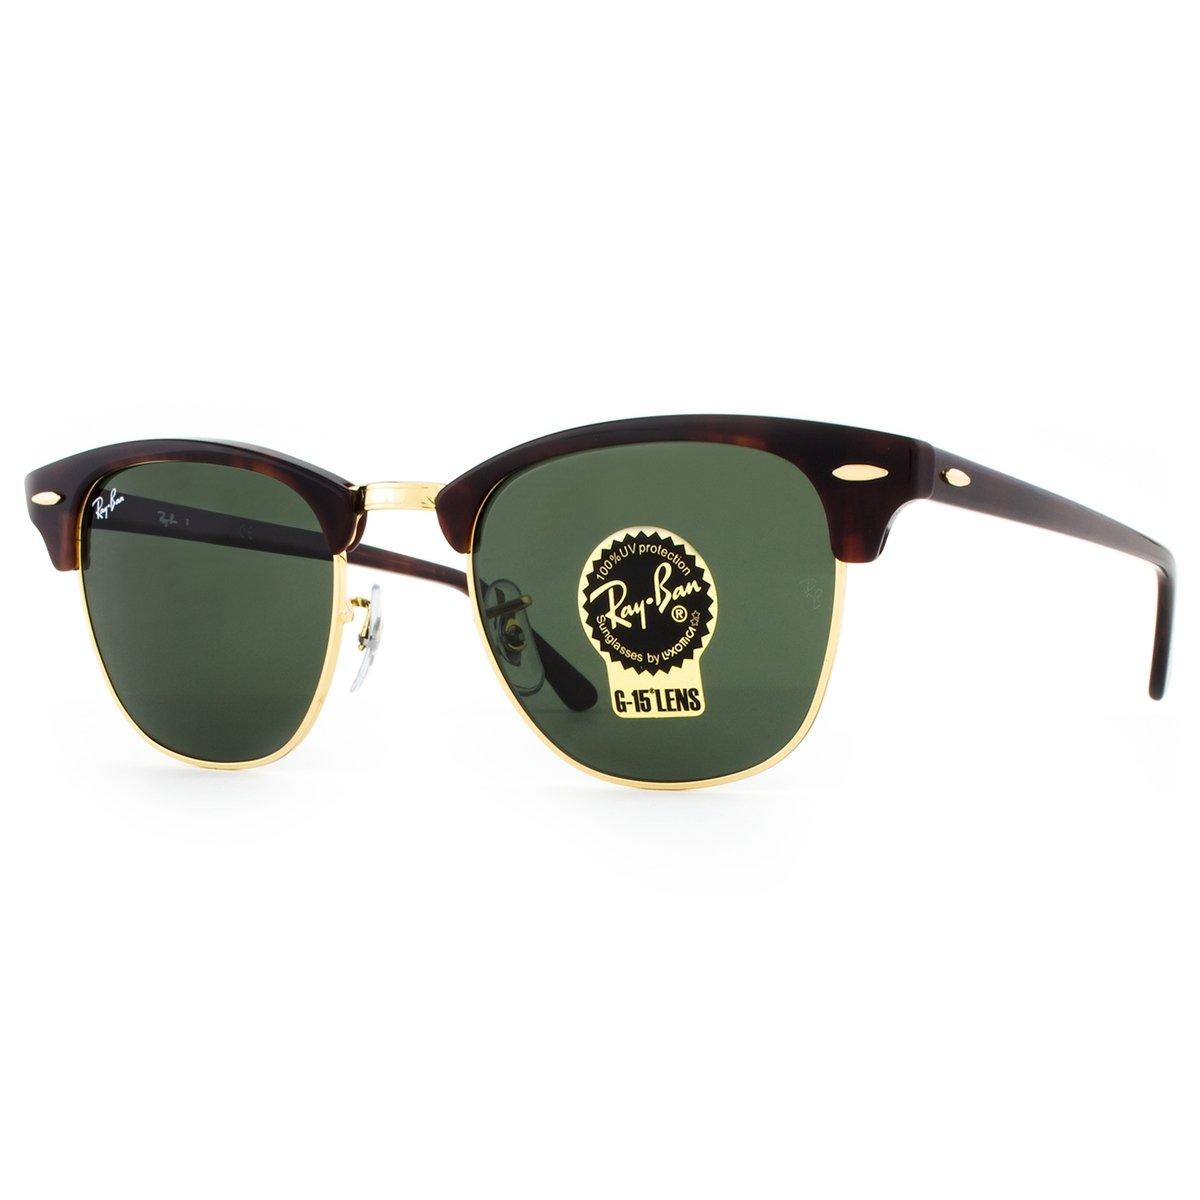 ab7ed66a54e826 ... Óculos de Sol Ray Ban Clubmaster Classic RB3016 W0366-51 Feminino ...